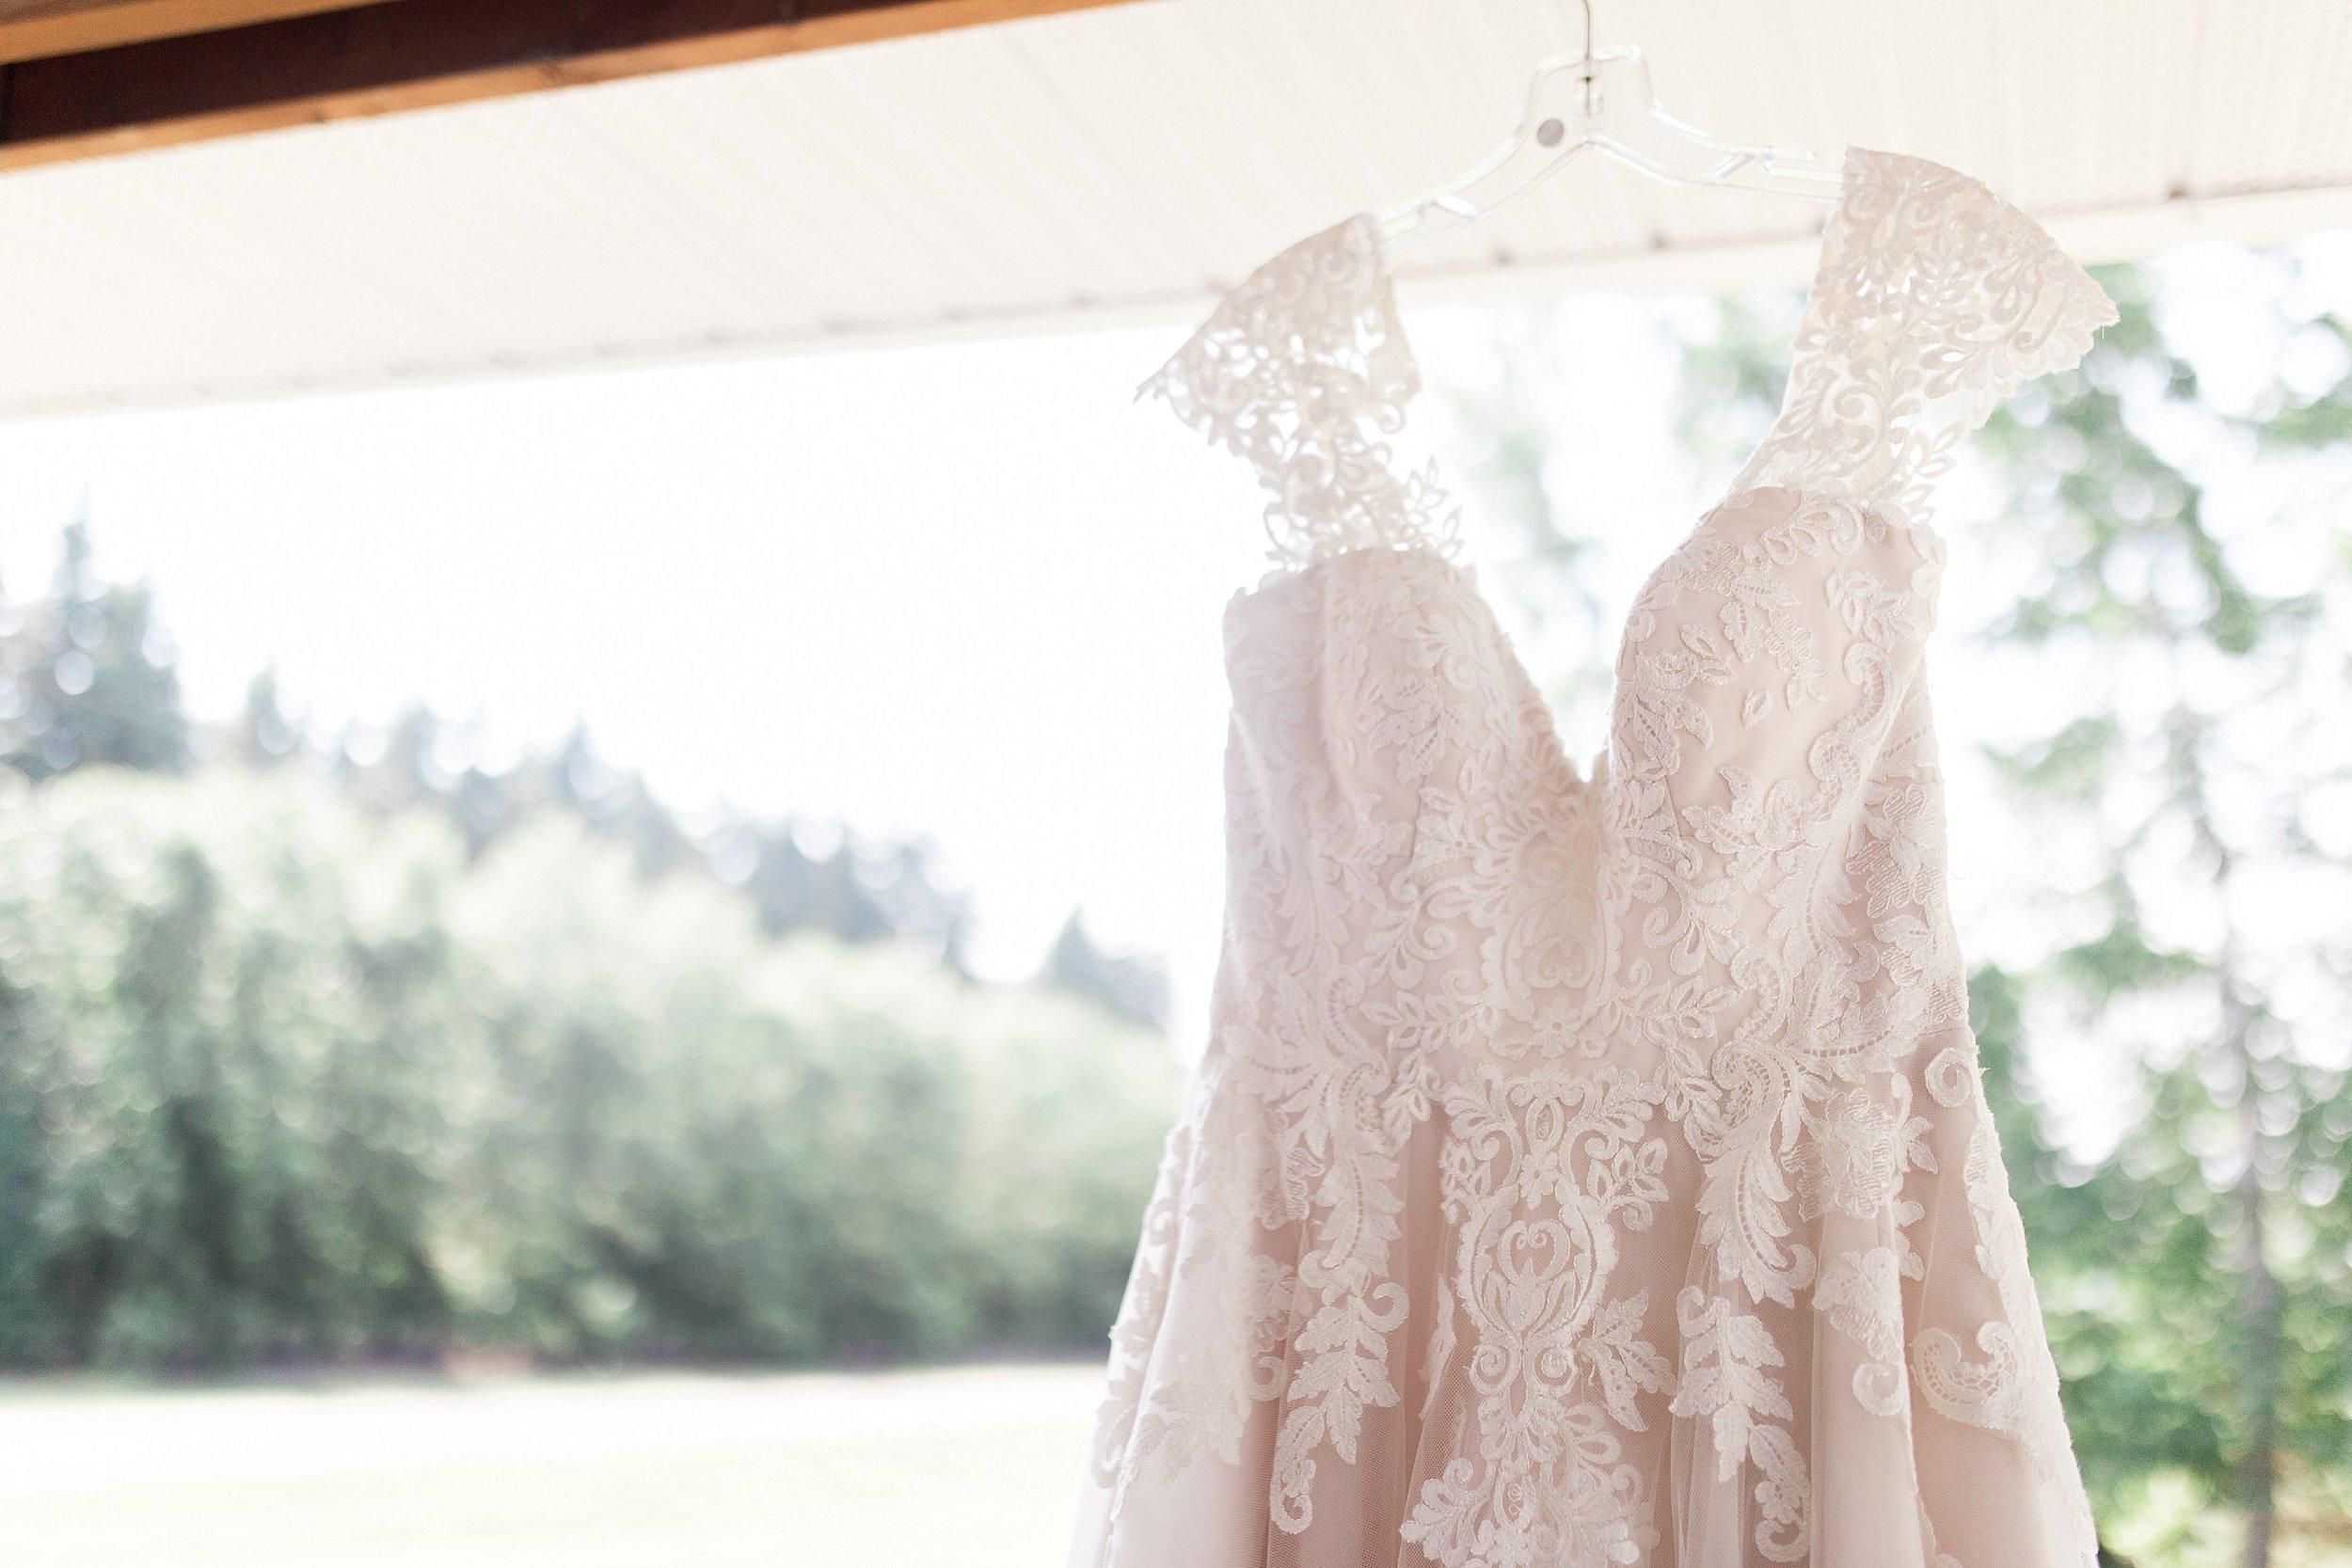 Blush Wedding Dress, Stella's Bridal Wedding Dress, Manitoba Wedding Photographer, Prairie Wedding, Keila Marie Photography